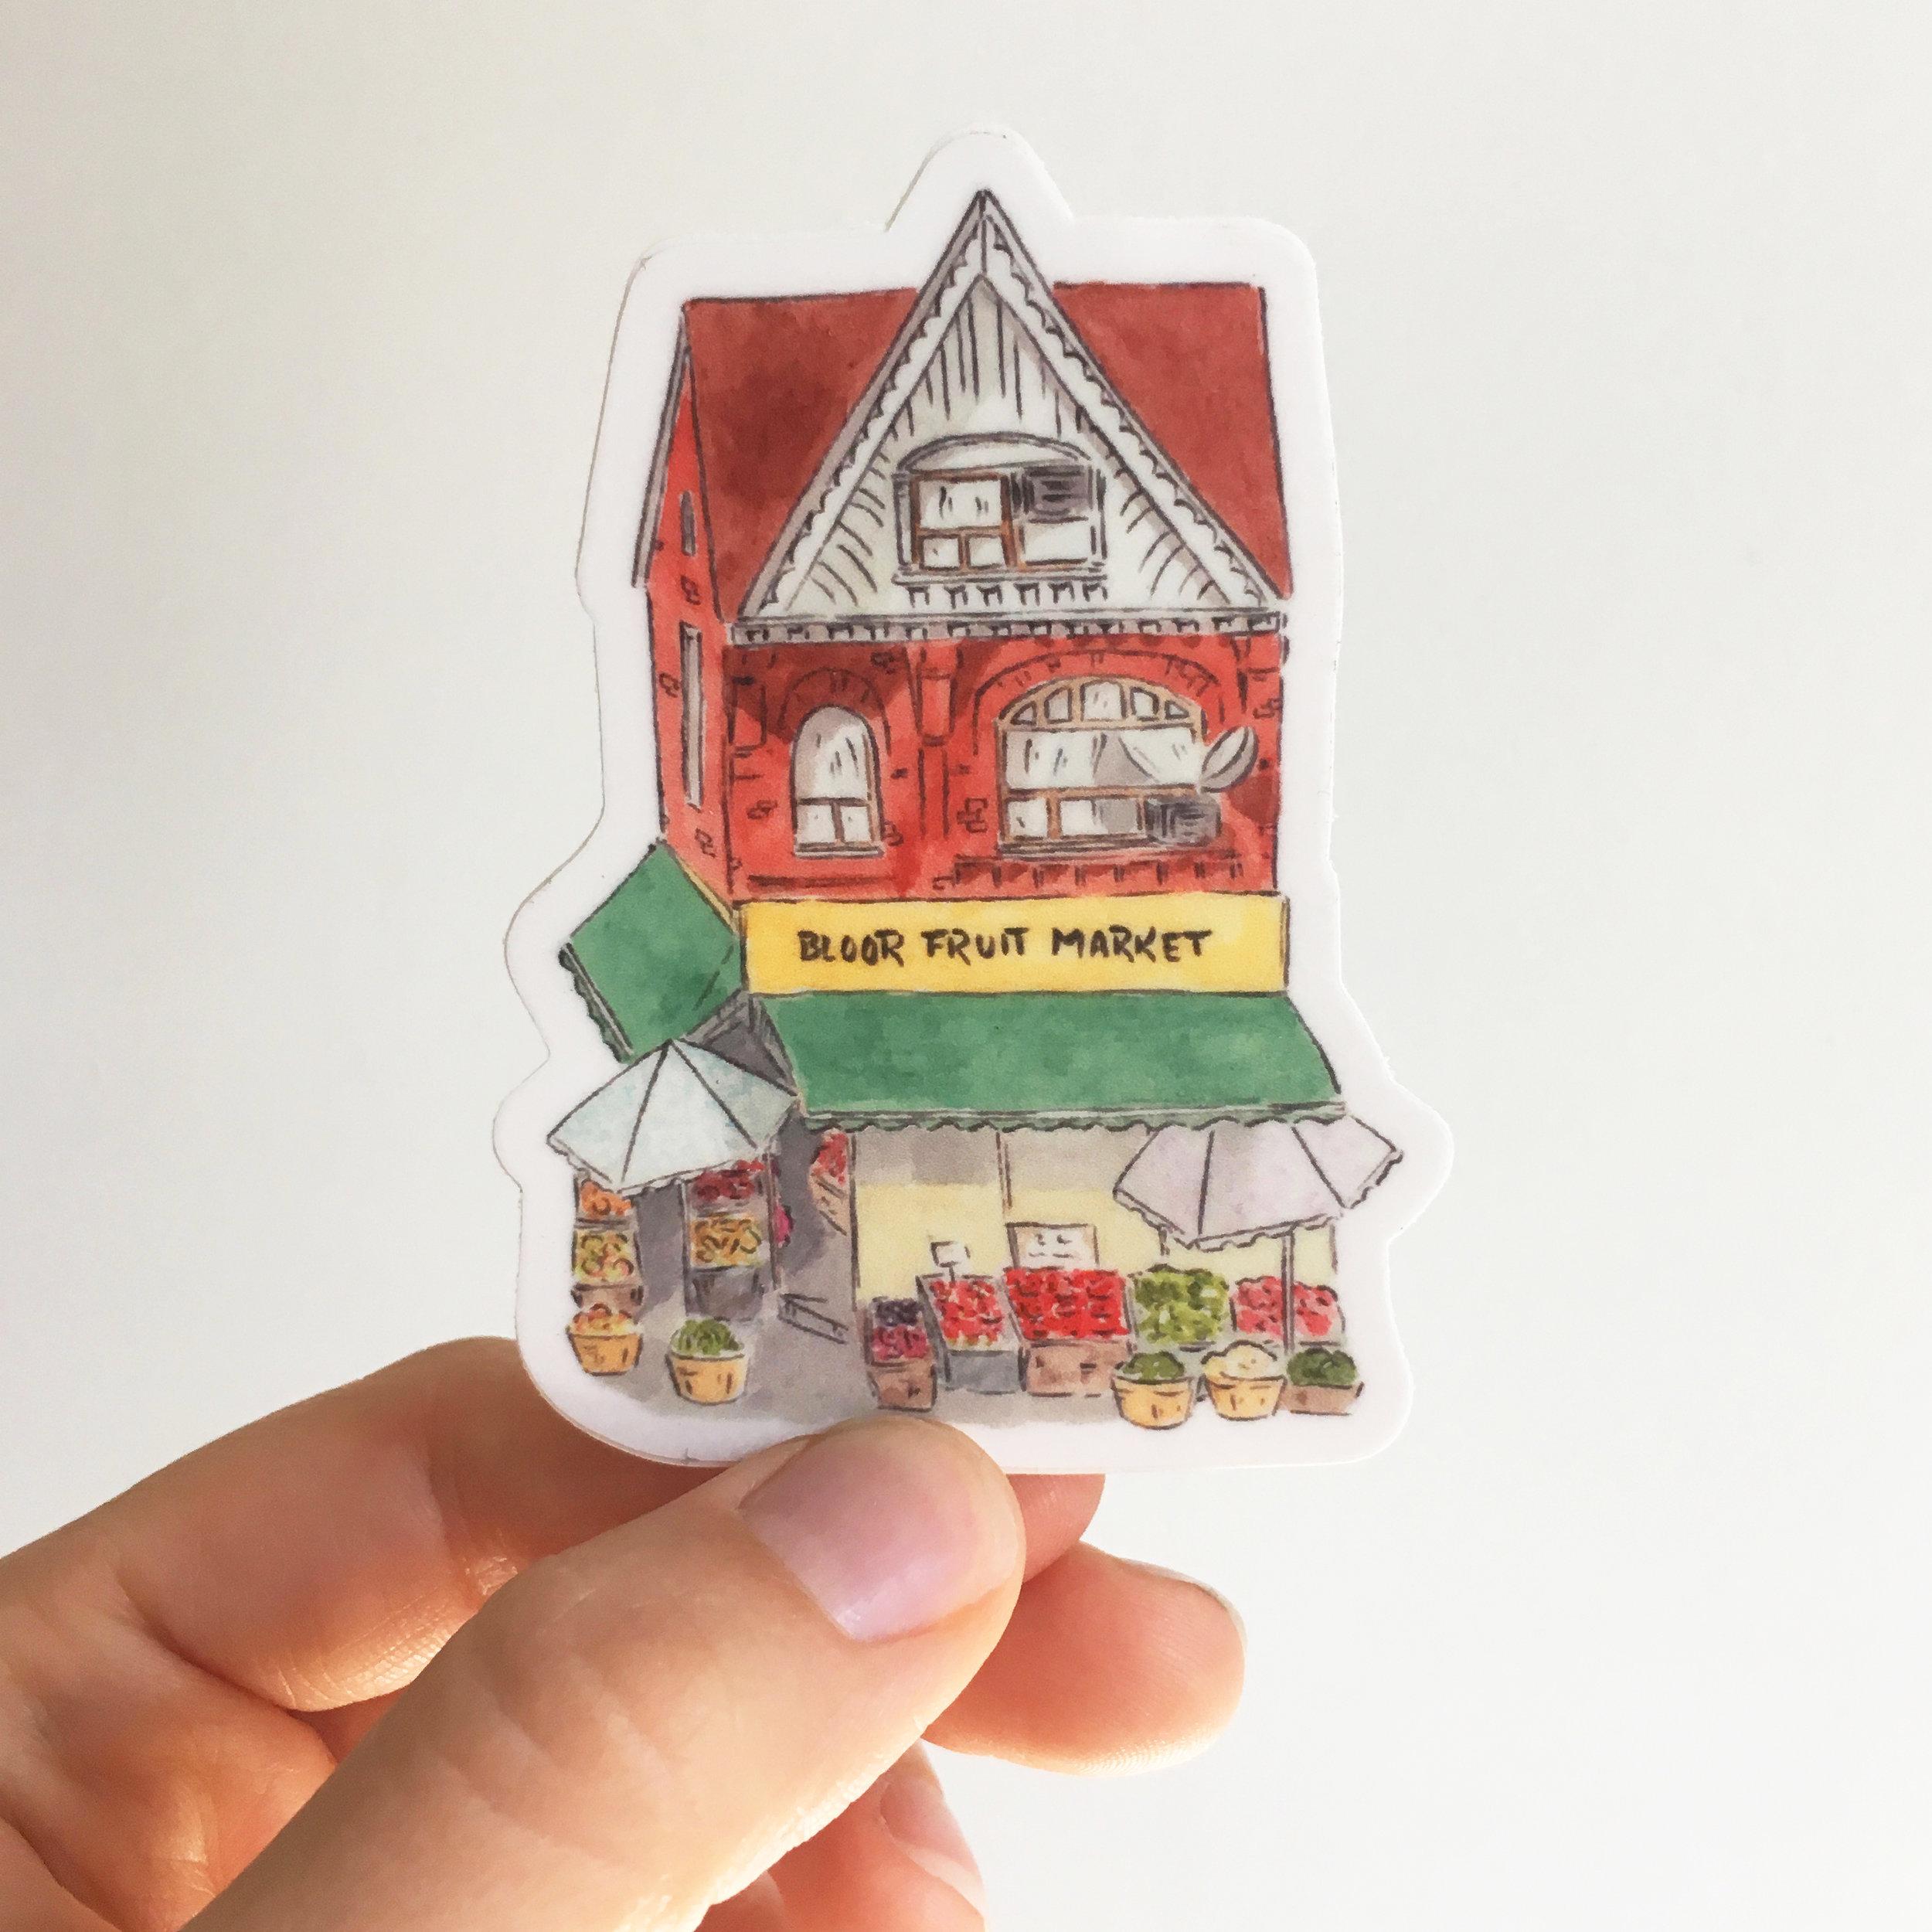 Bloor street sticker copy.jpg